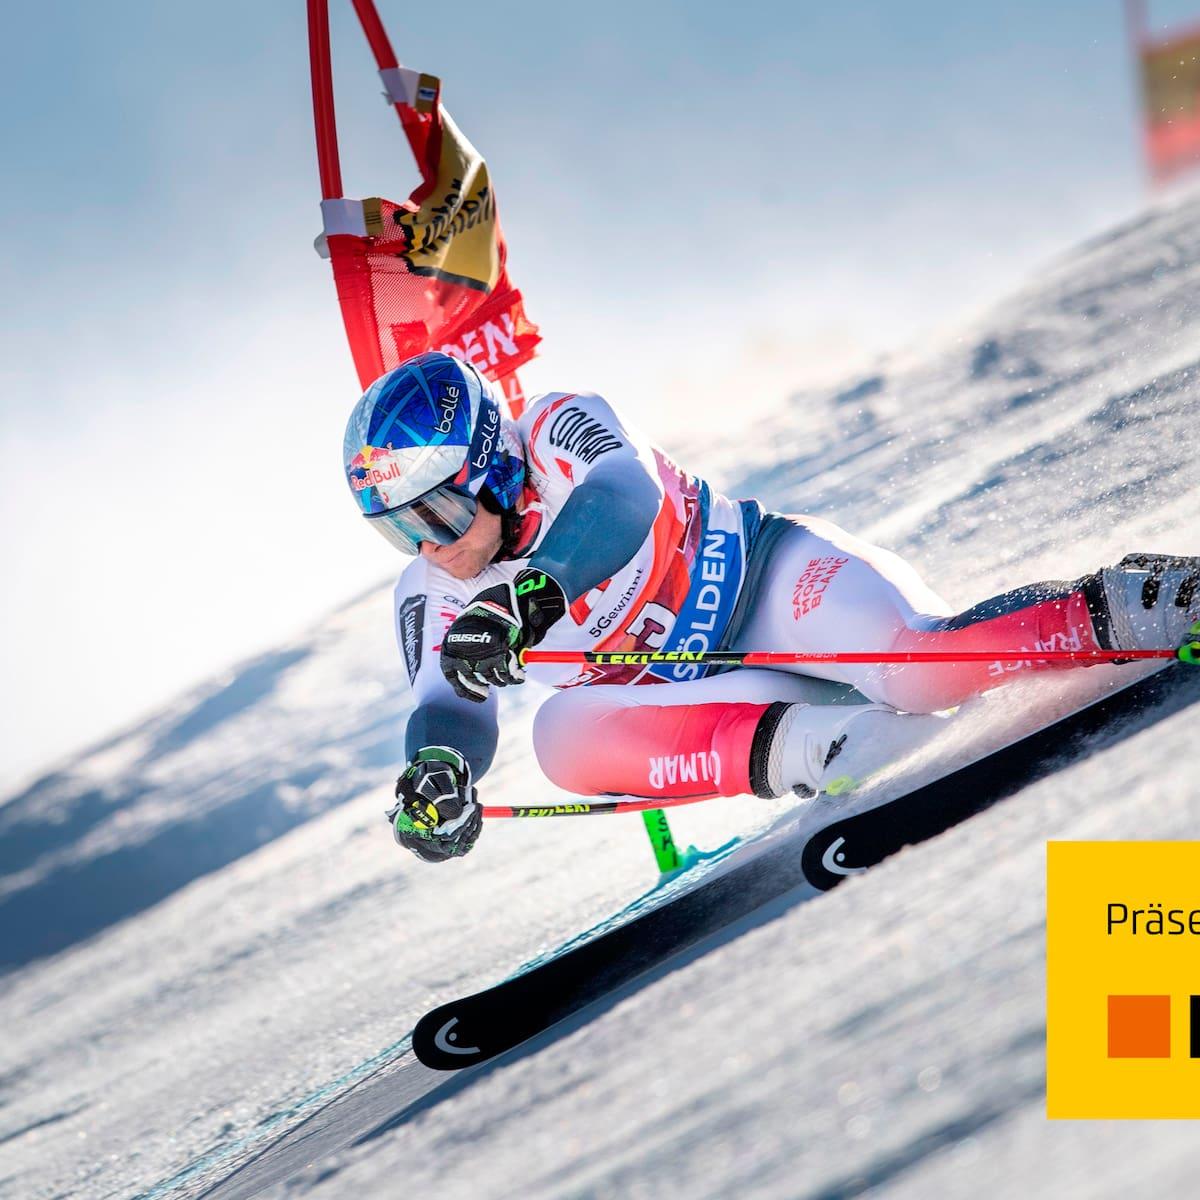 Ski Highlights Des Riesenslaloms Der Herren In Solden Blick